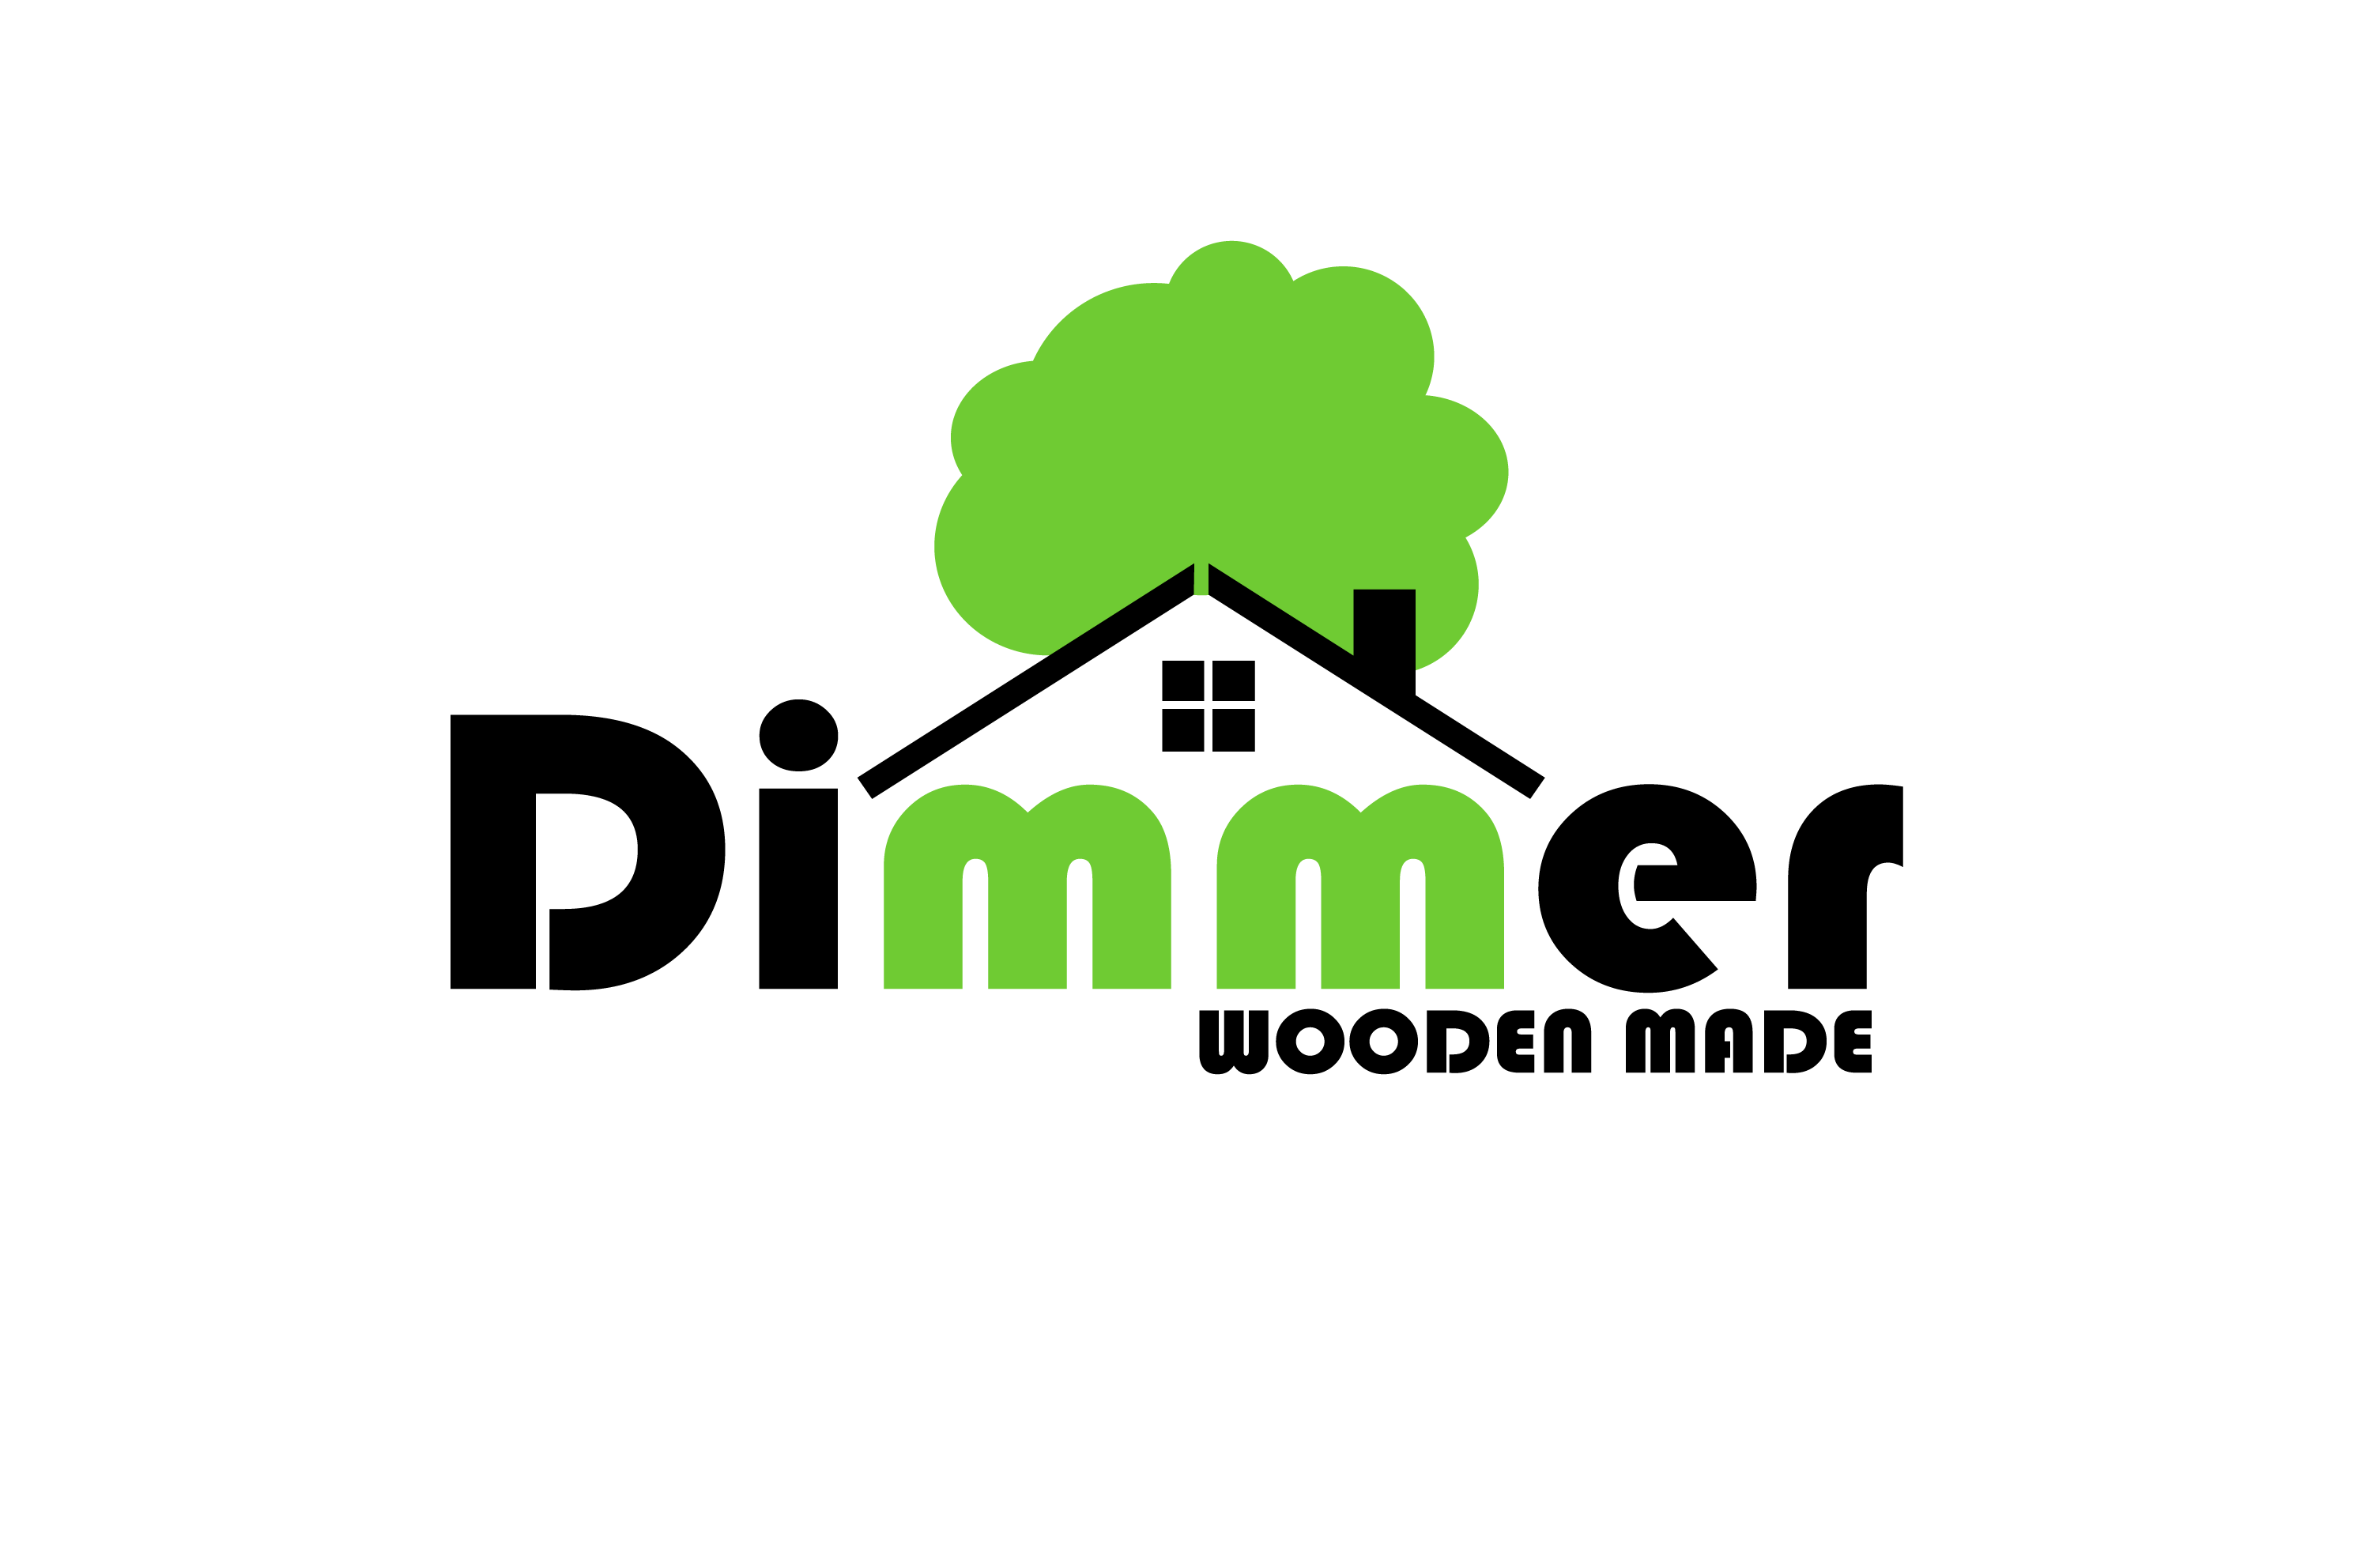 Dimmer - Wooden Made